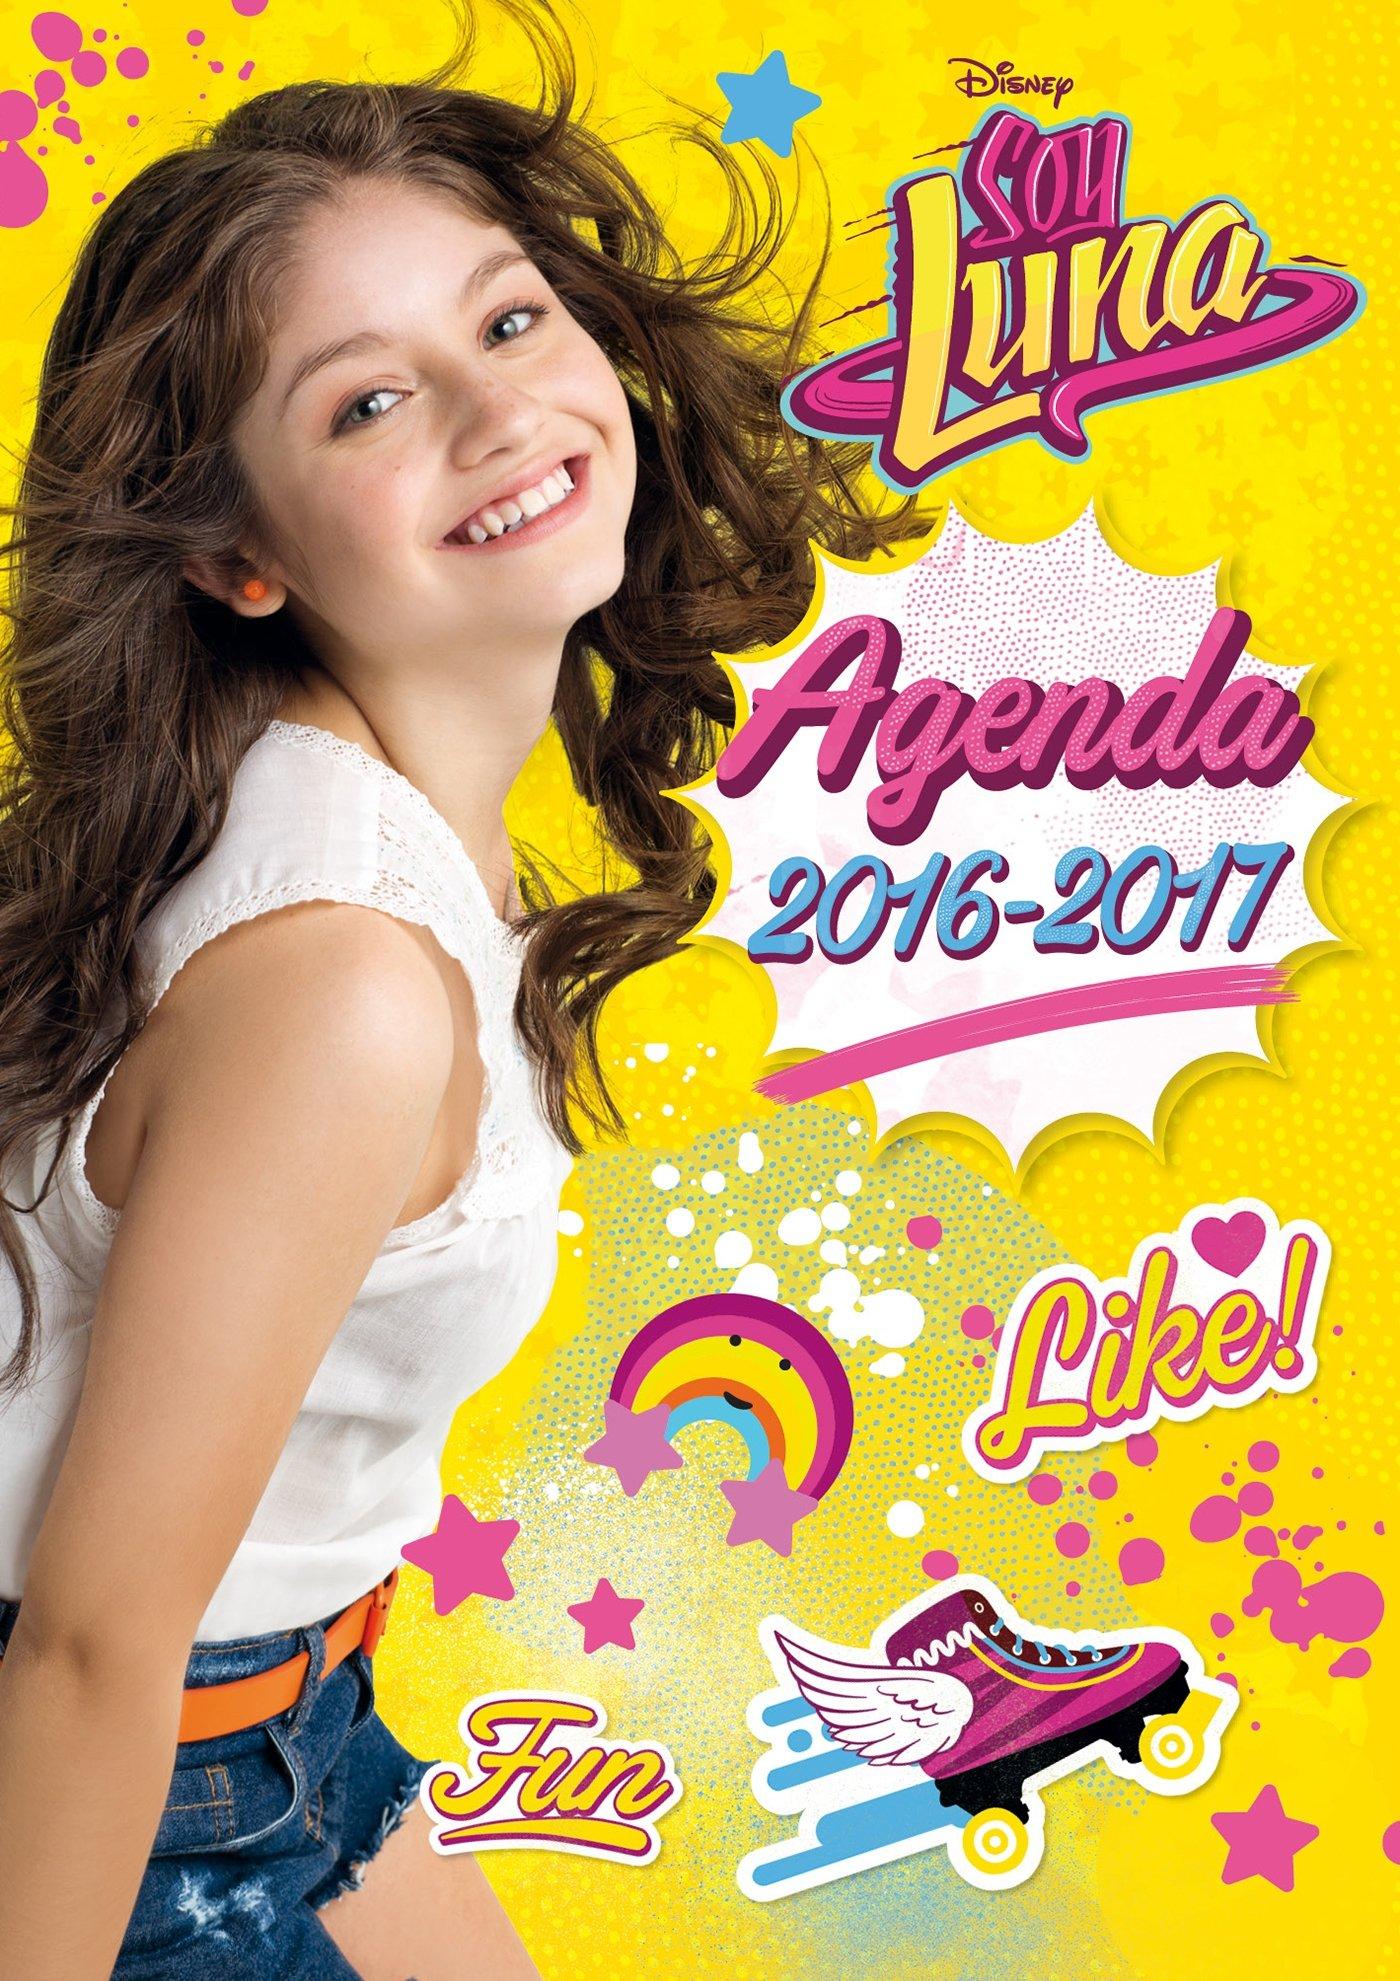 Soy Luna, AGENDA 2016-2017 (HJD.AUTRE IMAGE): Amazon.es ...